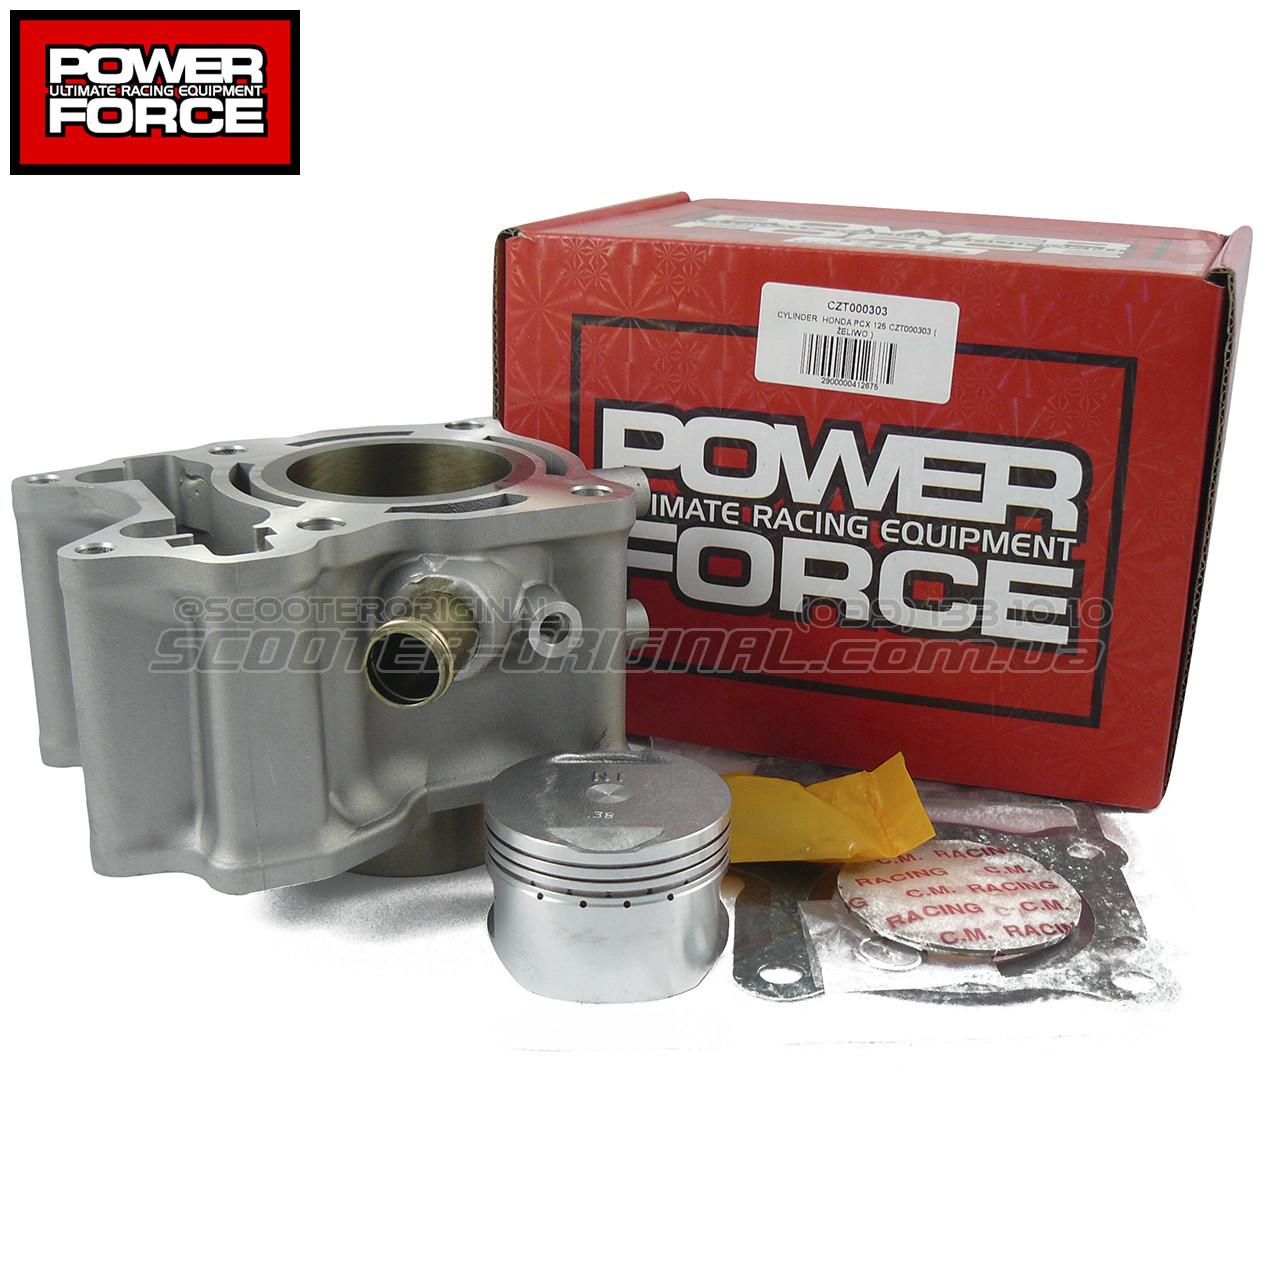 ЦПГ POWER FORCE 125cc Honda PCX 125 2010-2011 год